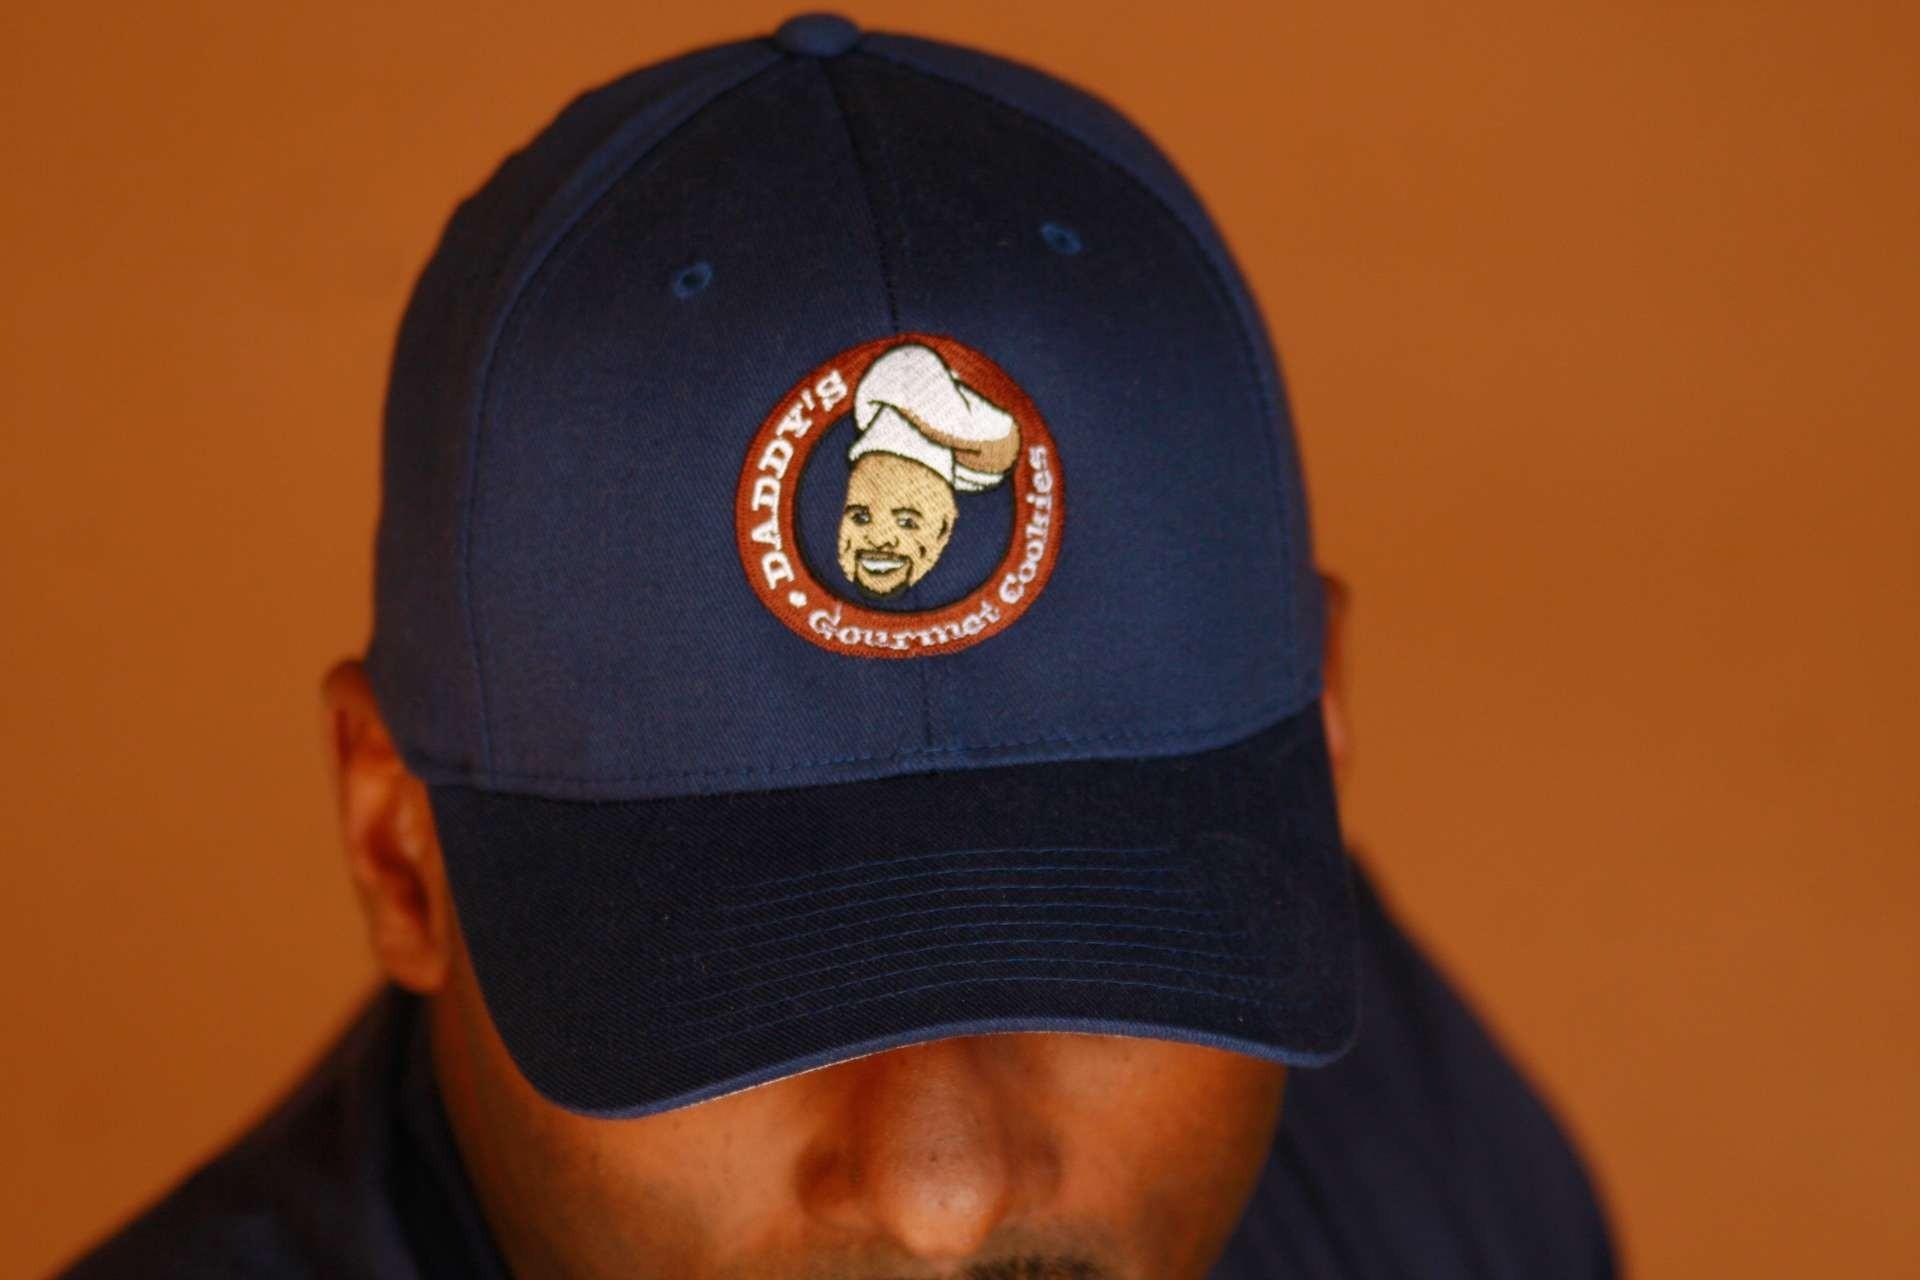 DGC FITTED CAP (FLEXFIT)